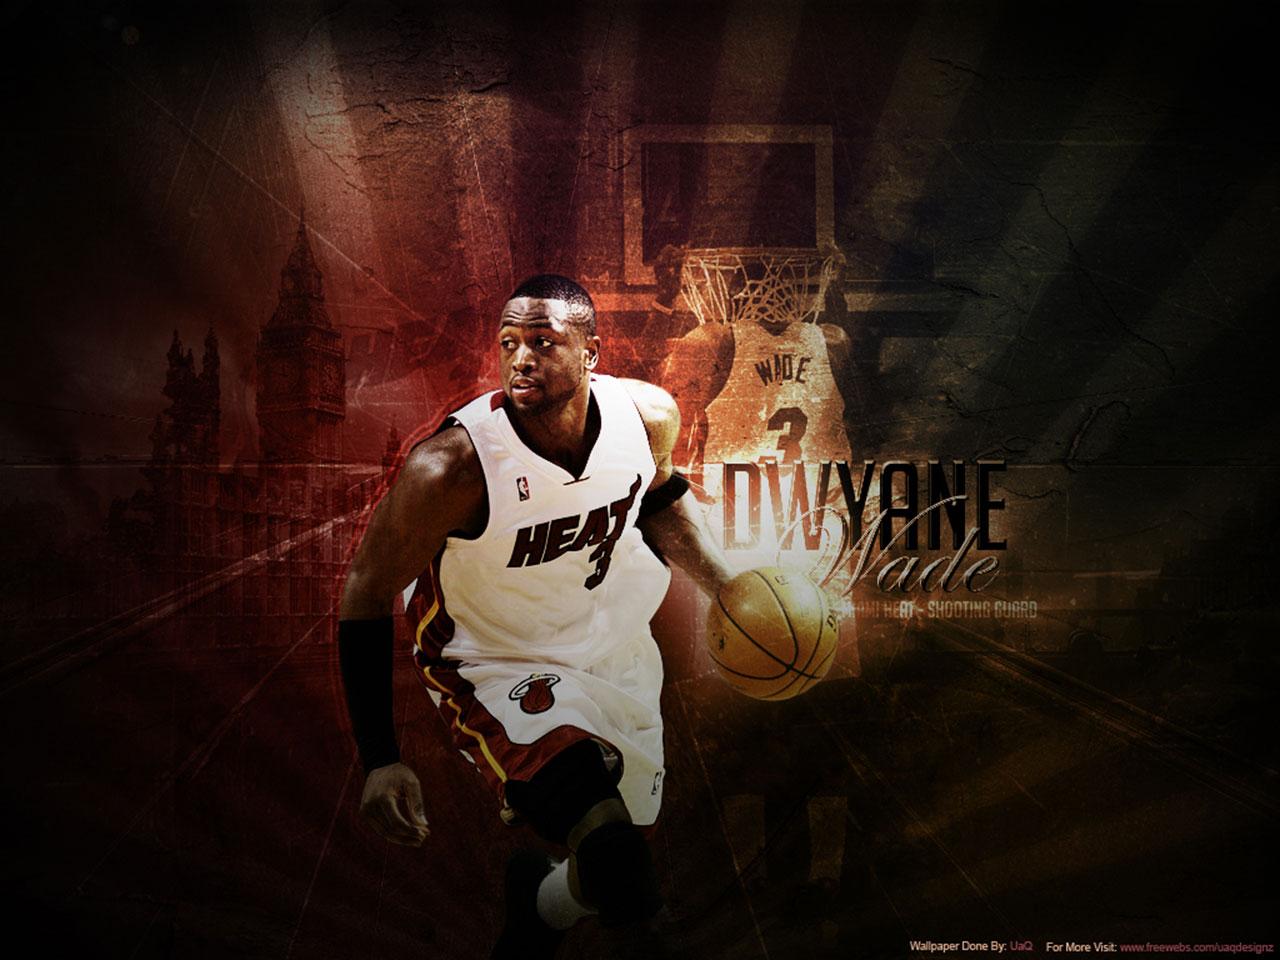 Dwyane Wade Wallpaper Big Fan of NBA   Daily Update 1280x960